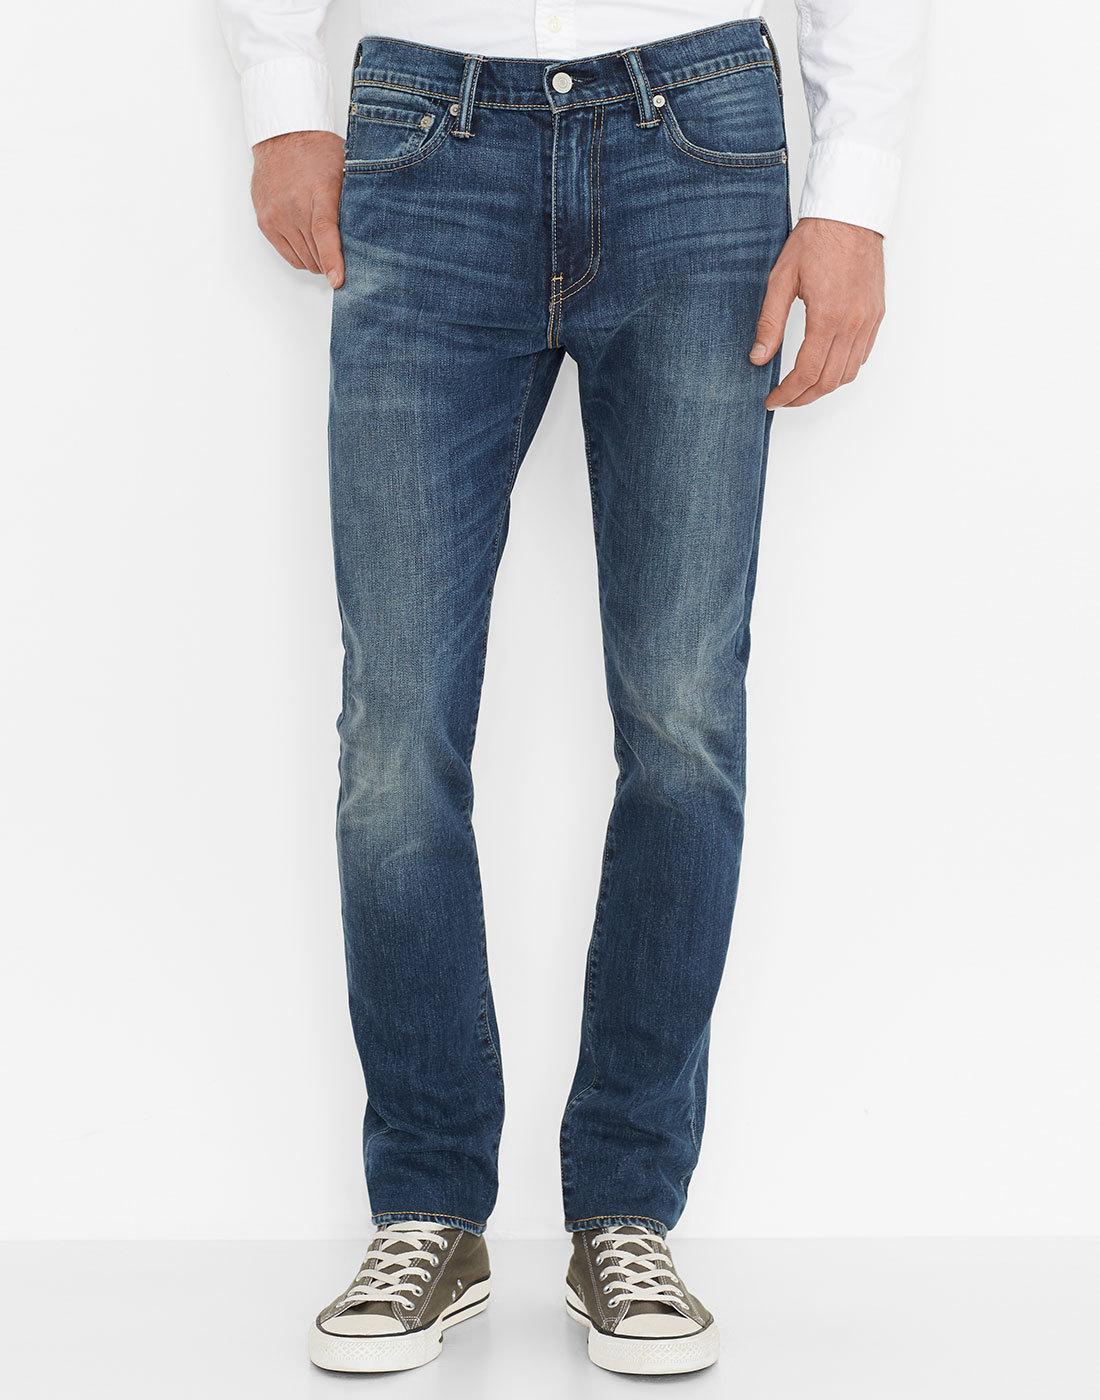 LEVI'S® 510 Retro Mod Skinny Jeans - Blue Canyon